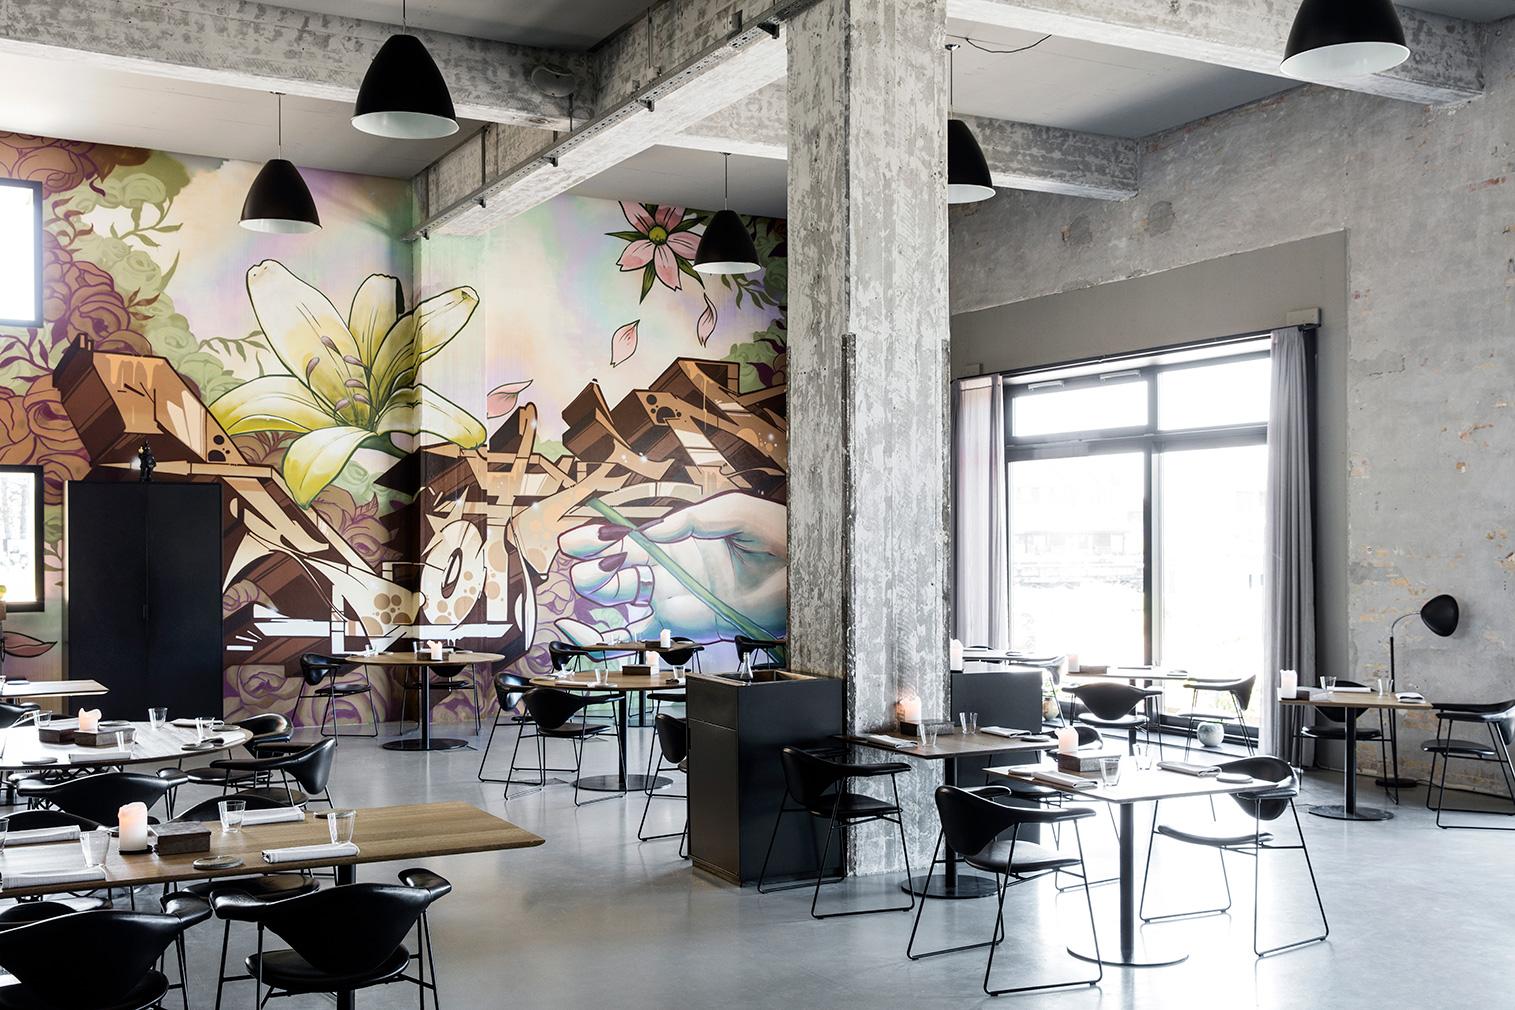 Amass restaurant in Copenhagen